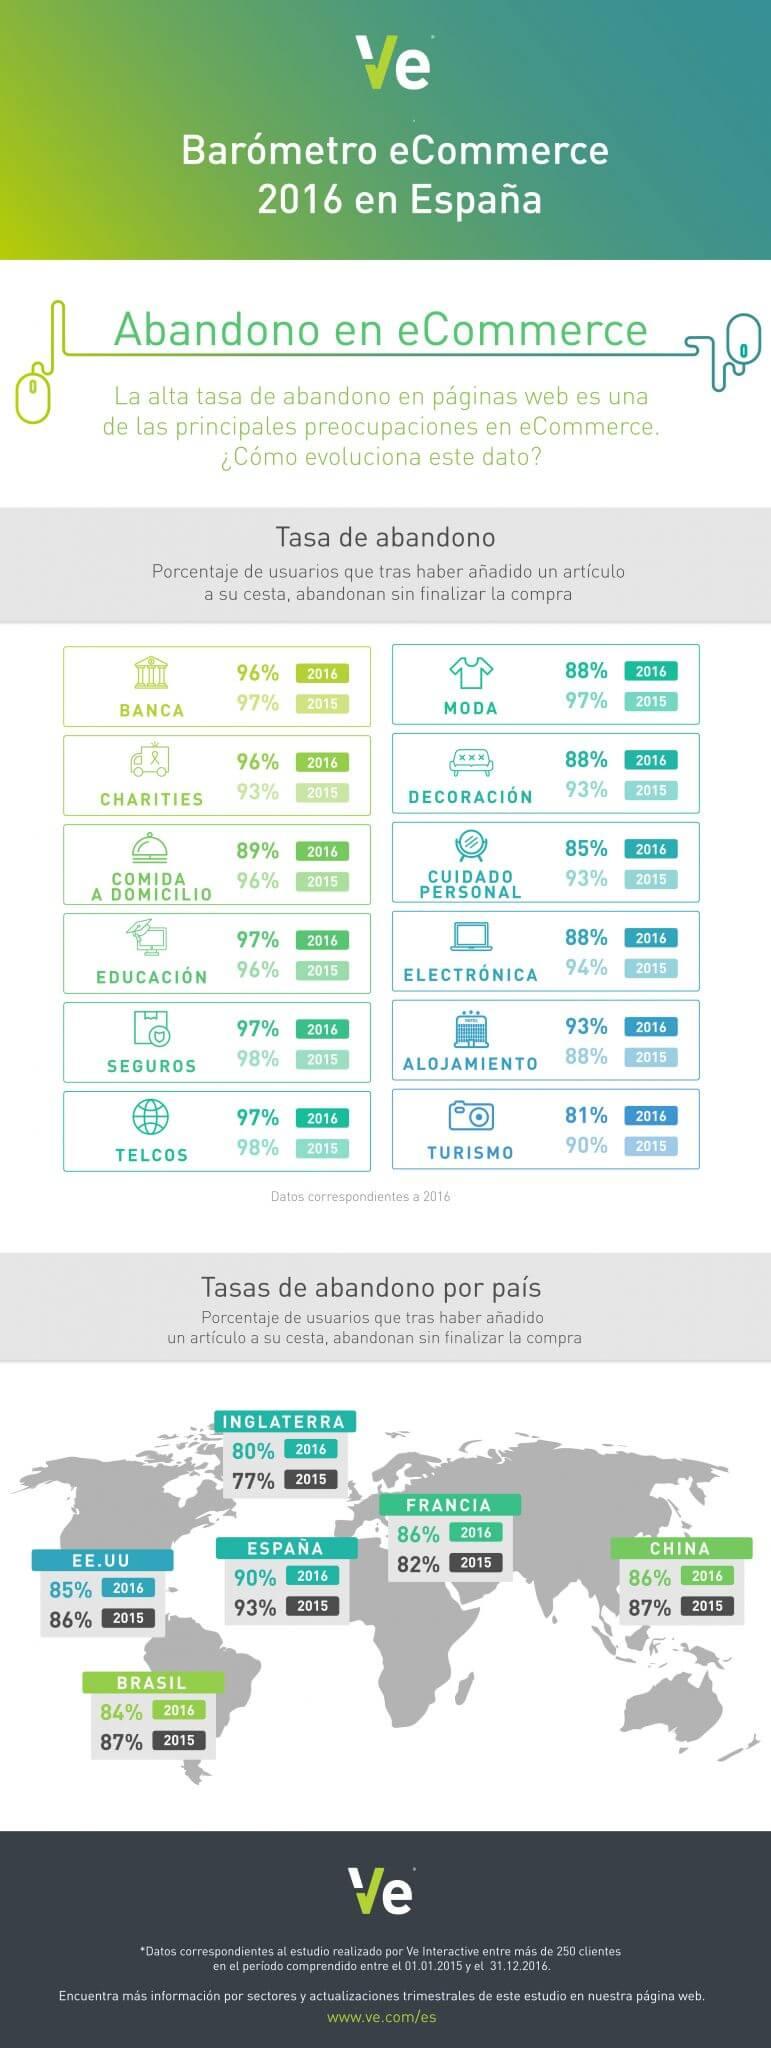 La fuerte tasa de abandono de la tienda online en España.